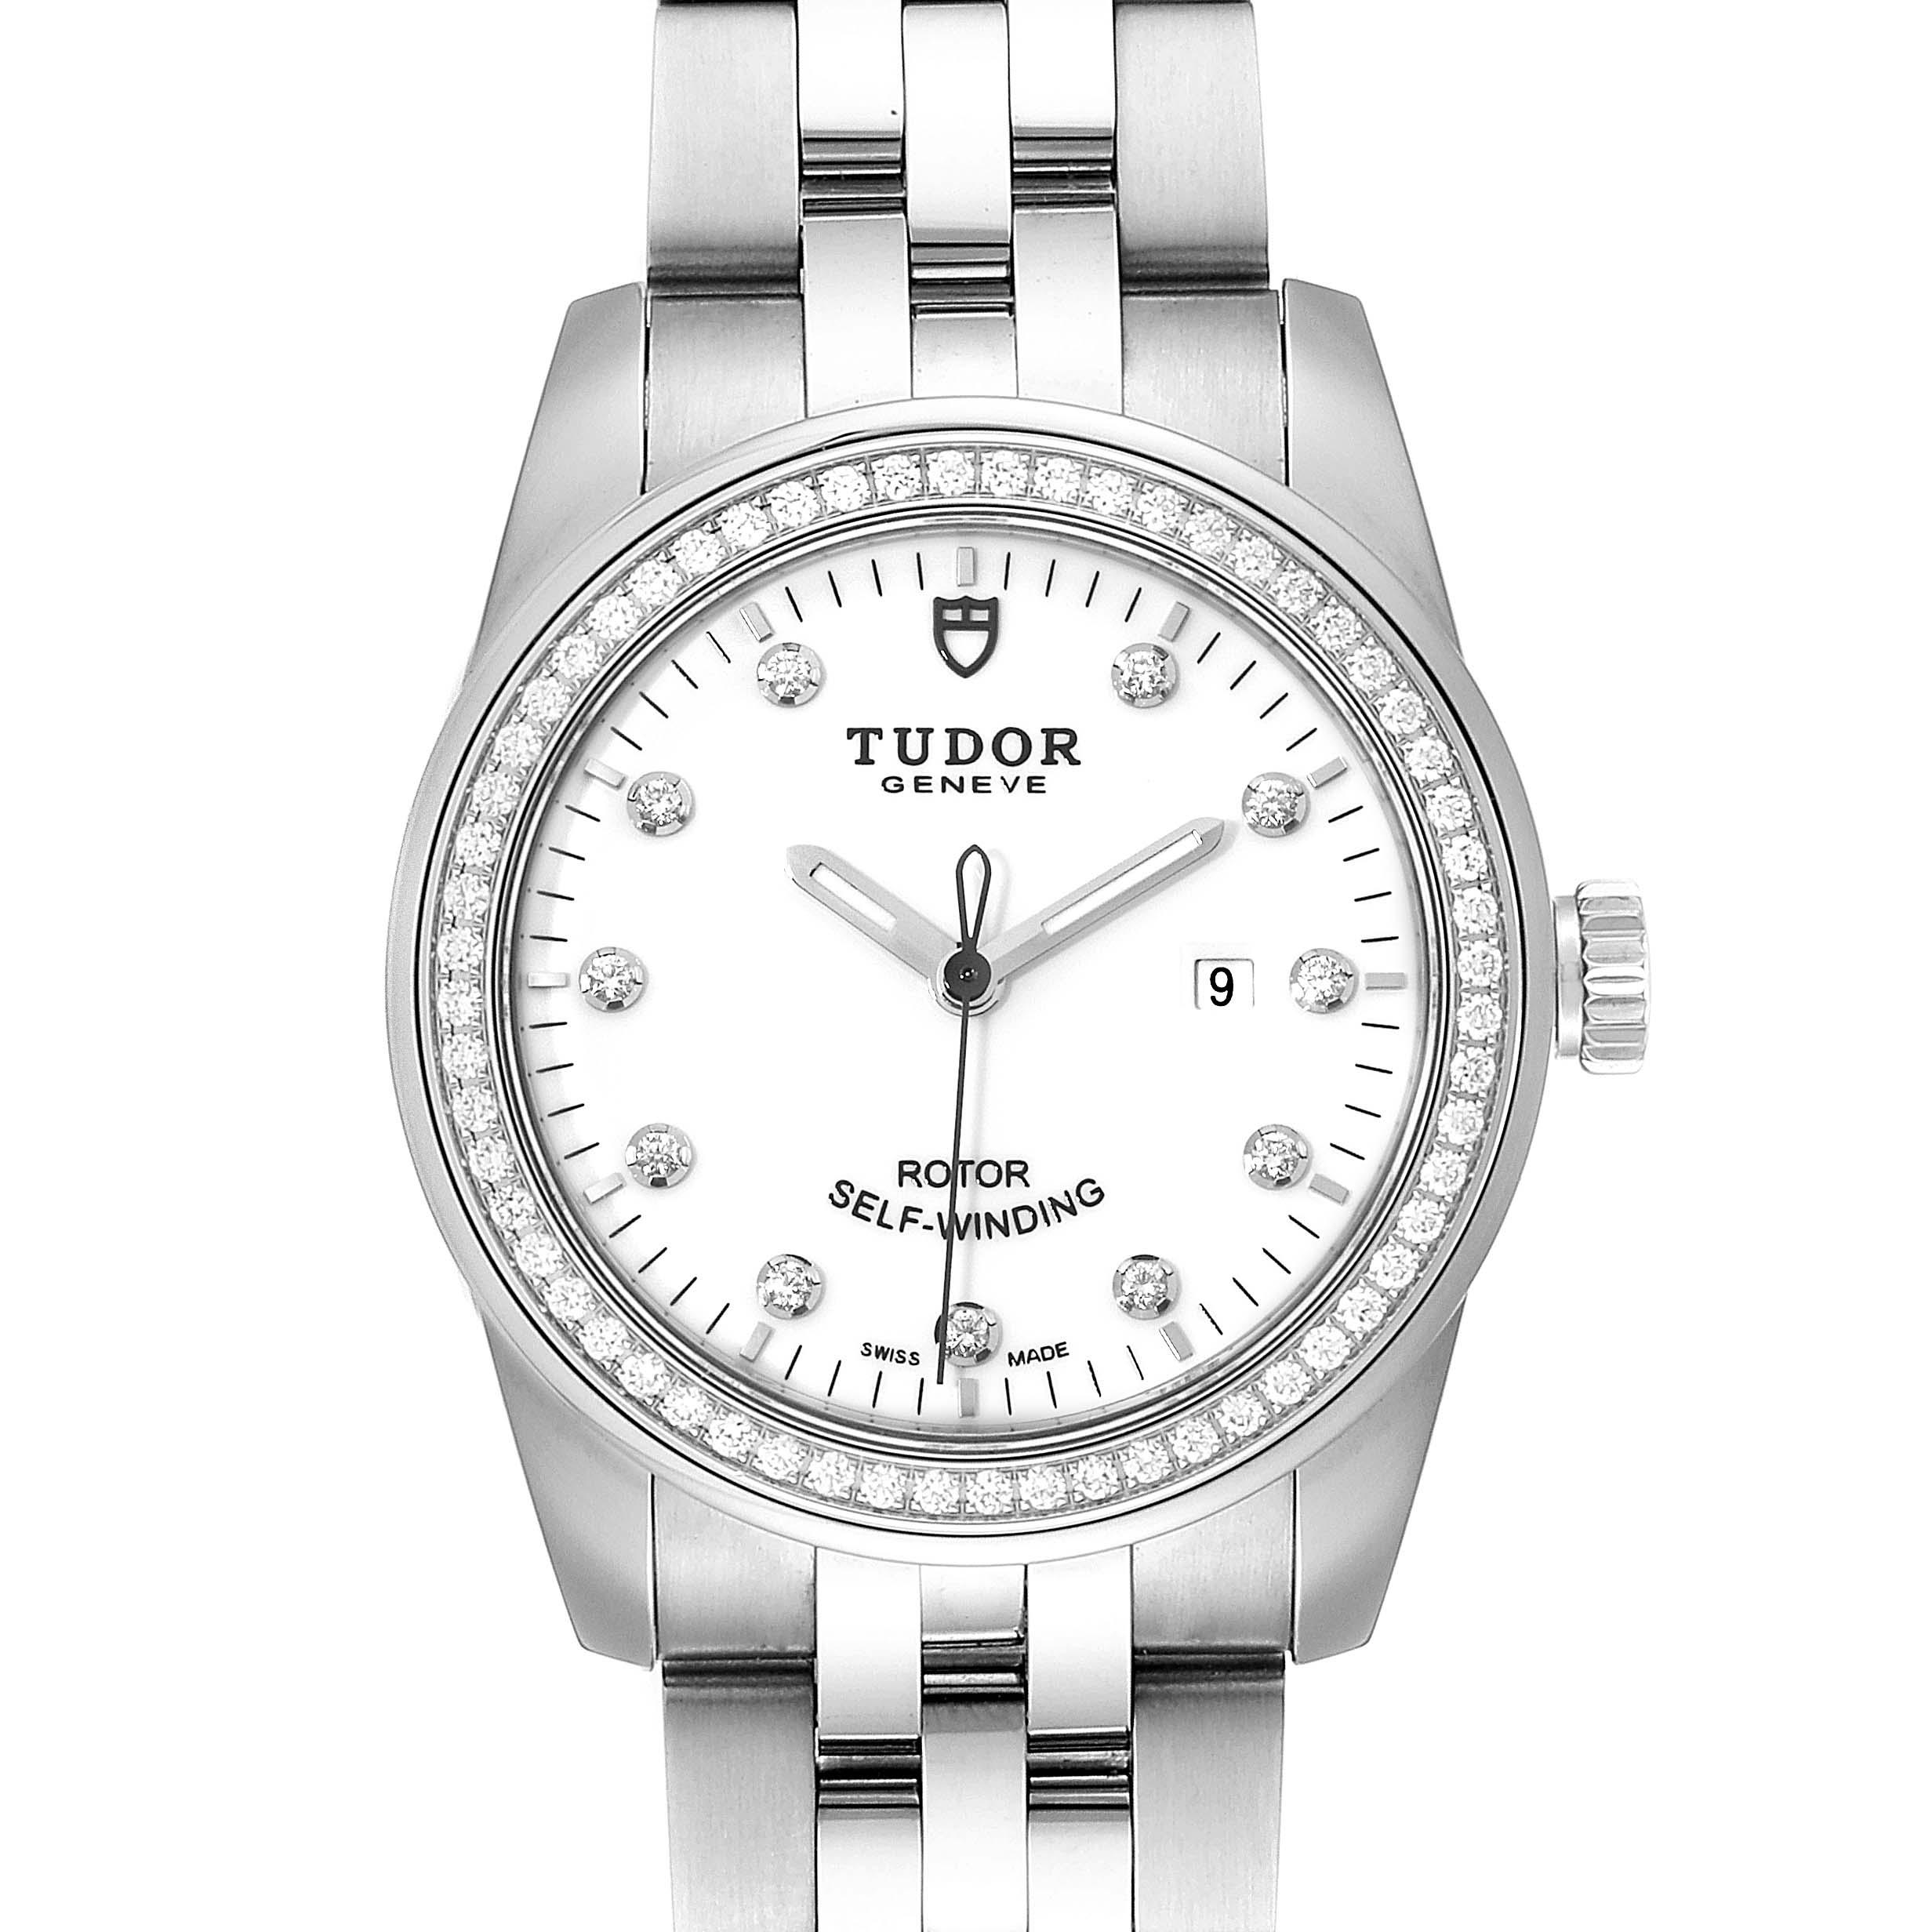 Photo of Tudor Glamour Date White Dial Diamond Steel Ladies Watch M53020 Unworn